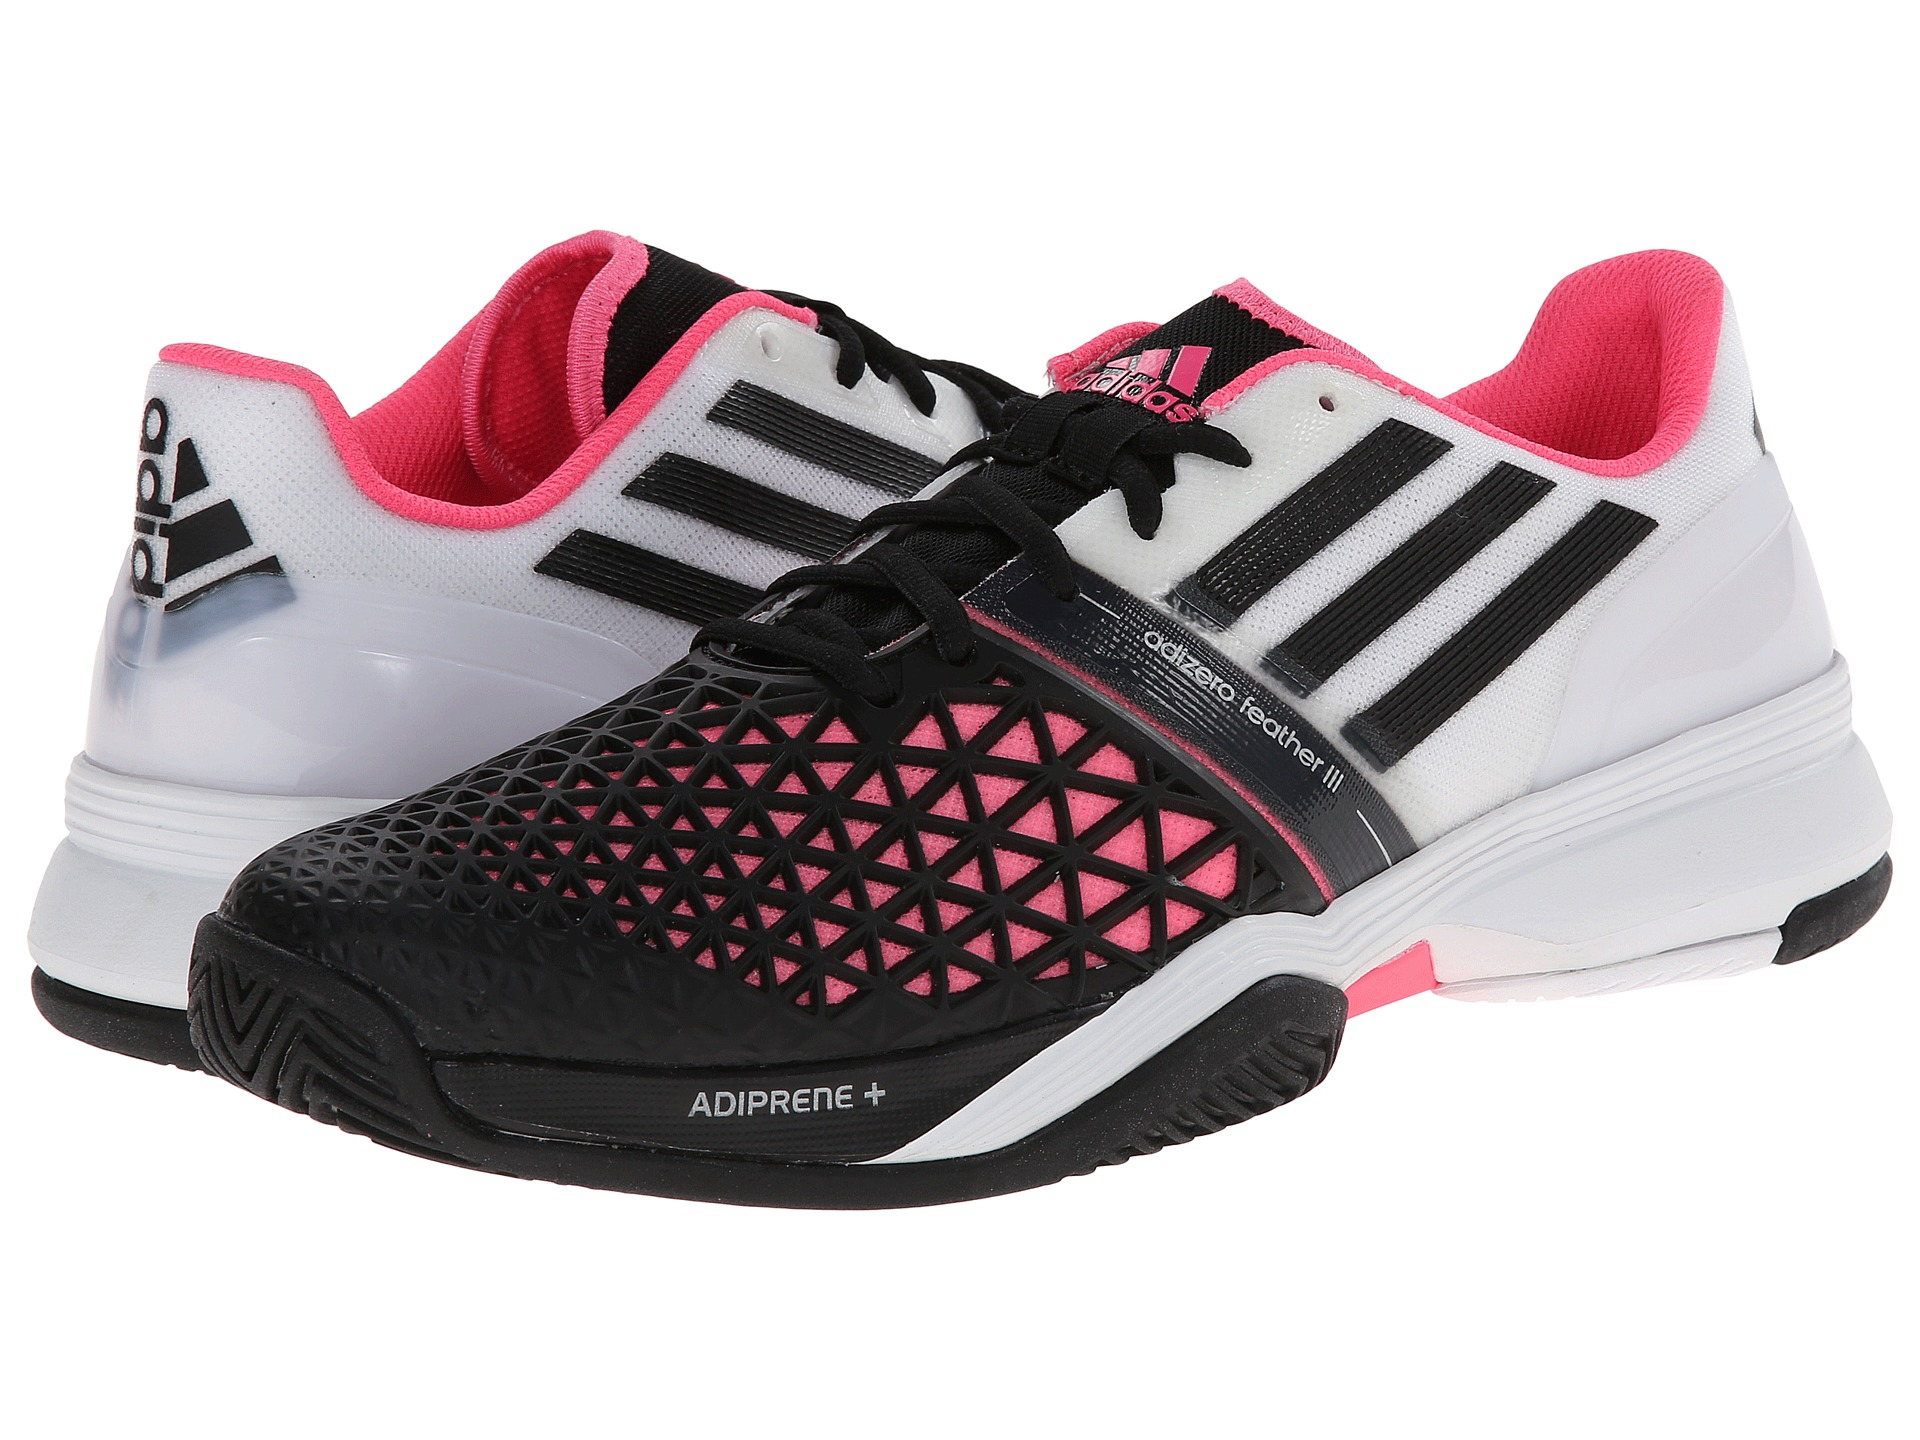 half off d0845 27a60 Adidas Cc Adizero Feather Iii White Black Solar Pink